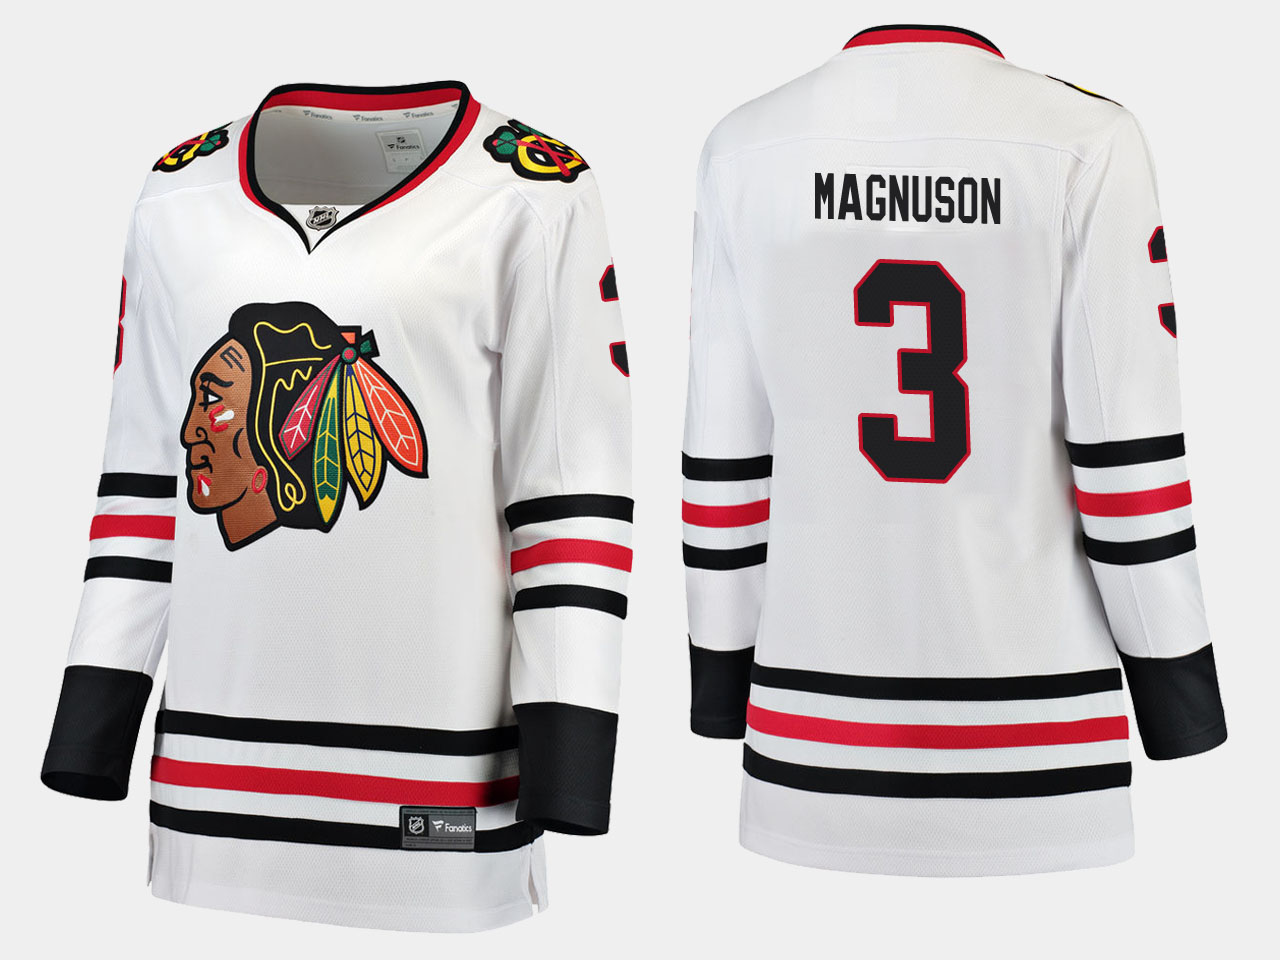 White Jersey Chicago Blackhawks Women's Road Keith Magnuson